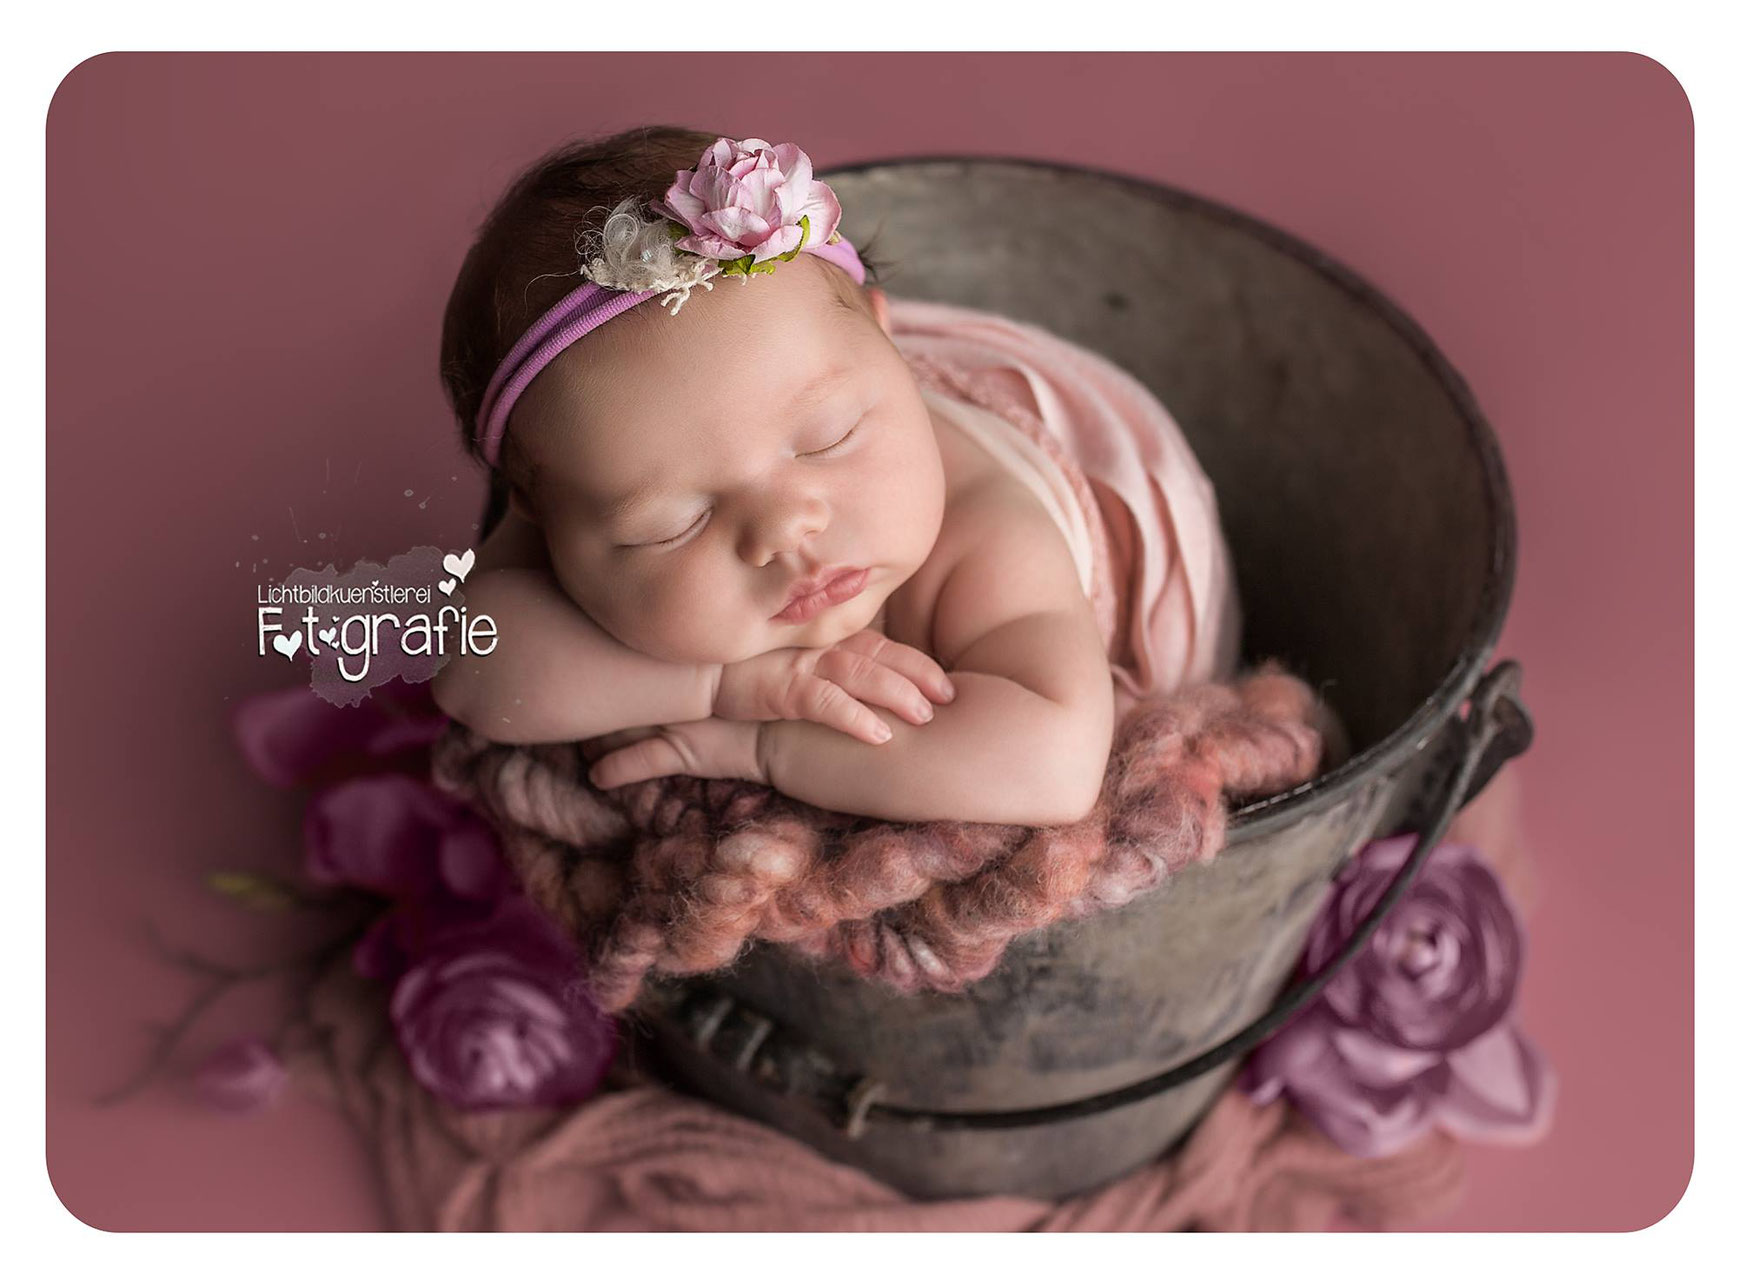 Fotoaccessoire Haarbandbabyphotografiebaby Shooting Baby Mädchen Haarband Für Taufe Haarband Für Neugeborenenphotografie Prop